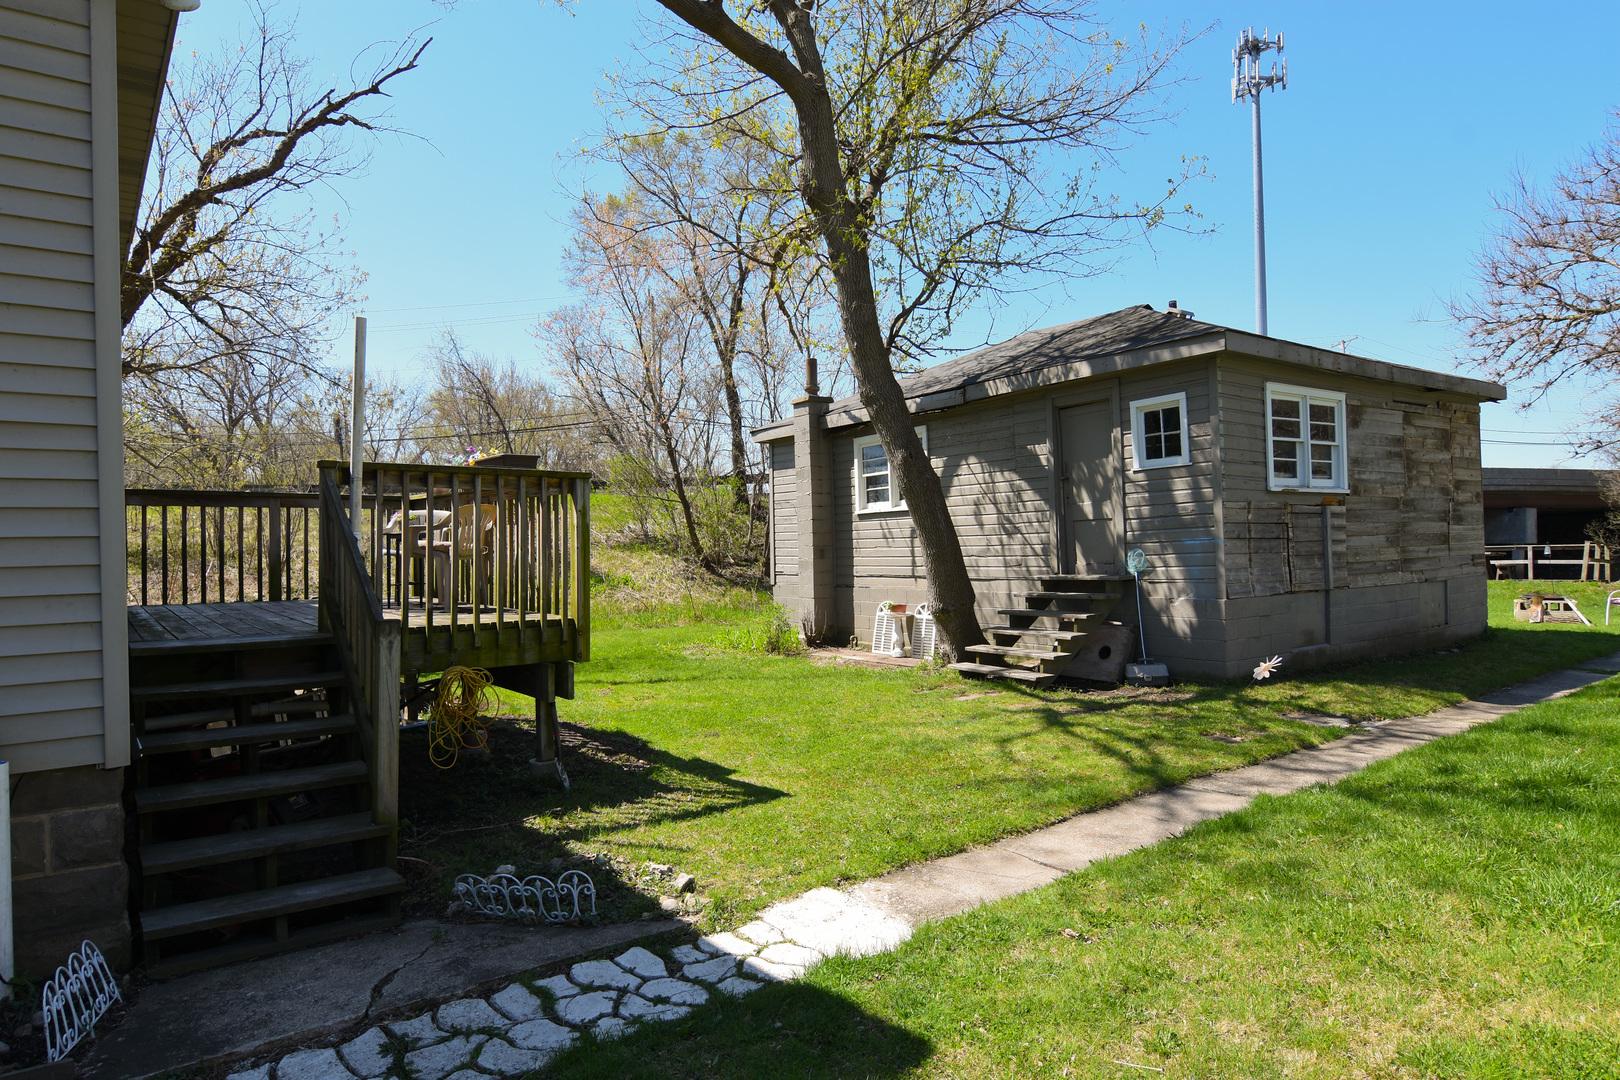 6107 State Park, Spring Grove, Illinois, 60081